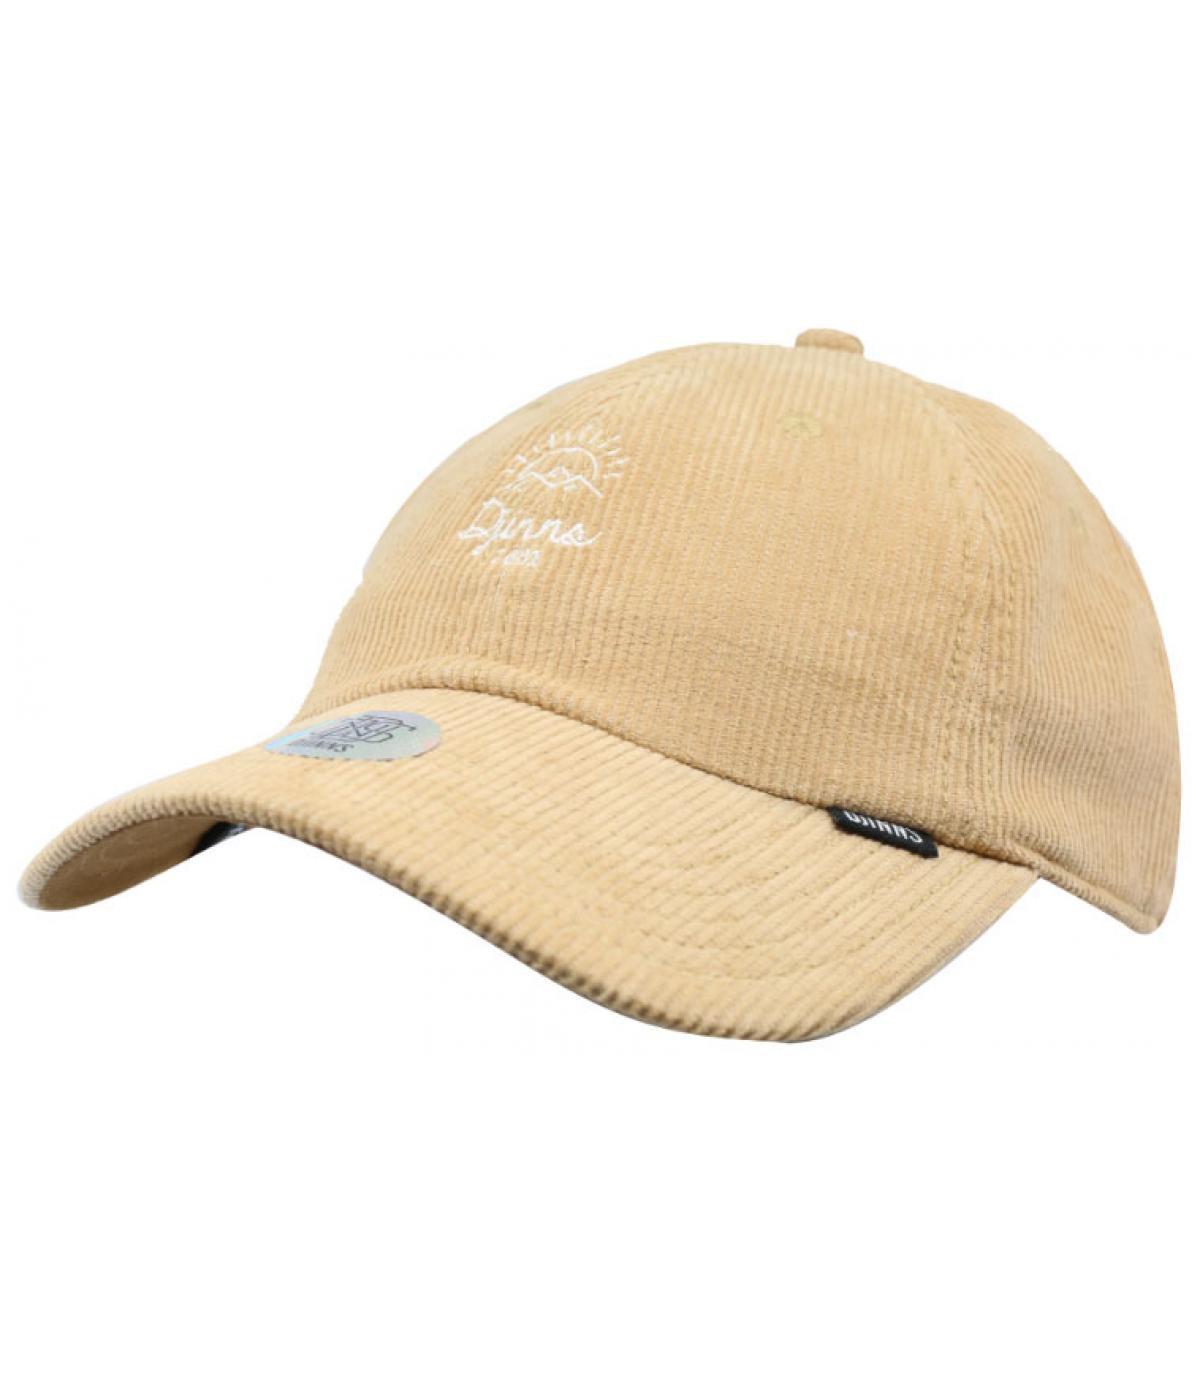 gorra pana beis Djinns - Dad Cap Corduroy Rev Wheat de Djinns. Headict 7b3df62bc4b